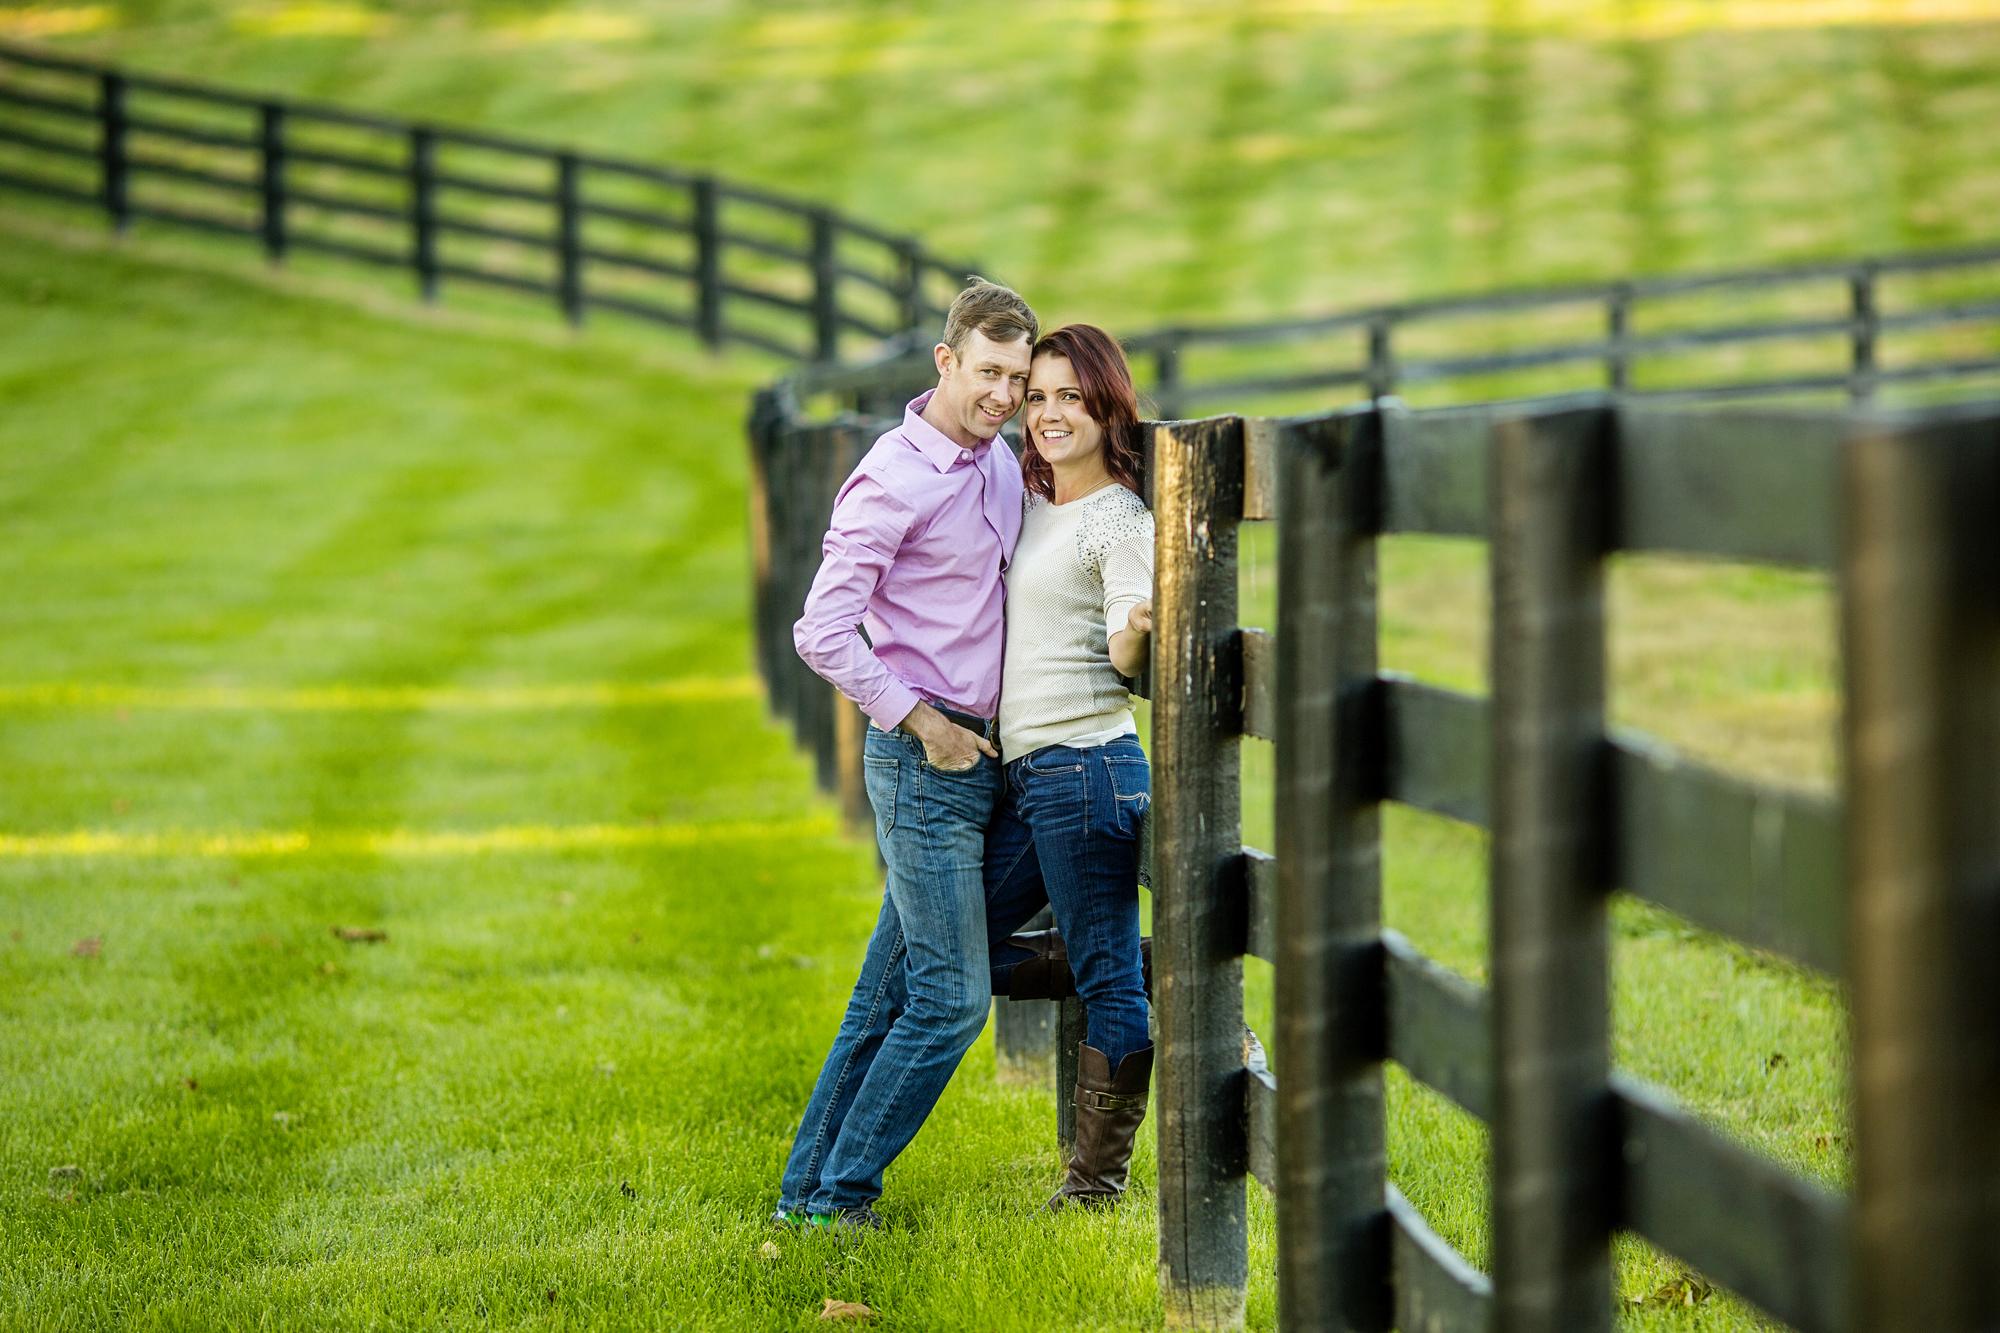 Seriously_Sabrina_Photography_Lexington_Kentucky_Burl_Winstar_Farm_Engagement_AliJerry_24.jpg